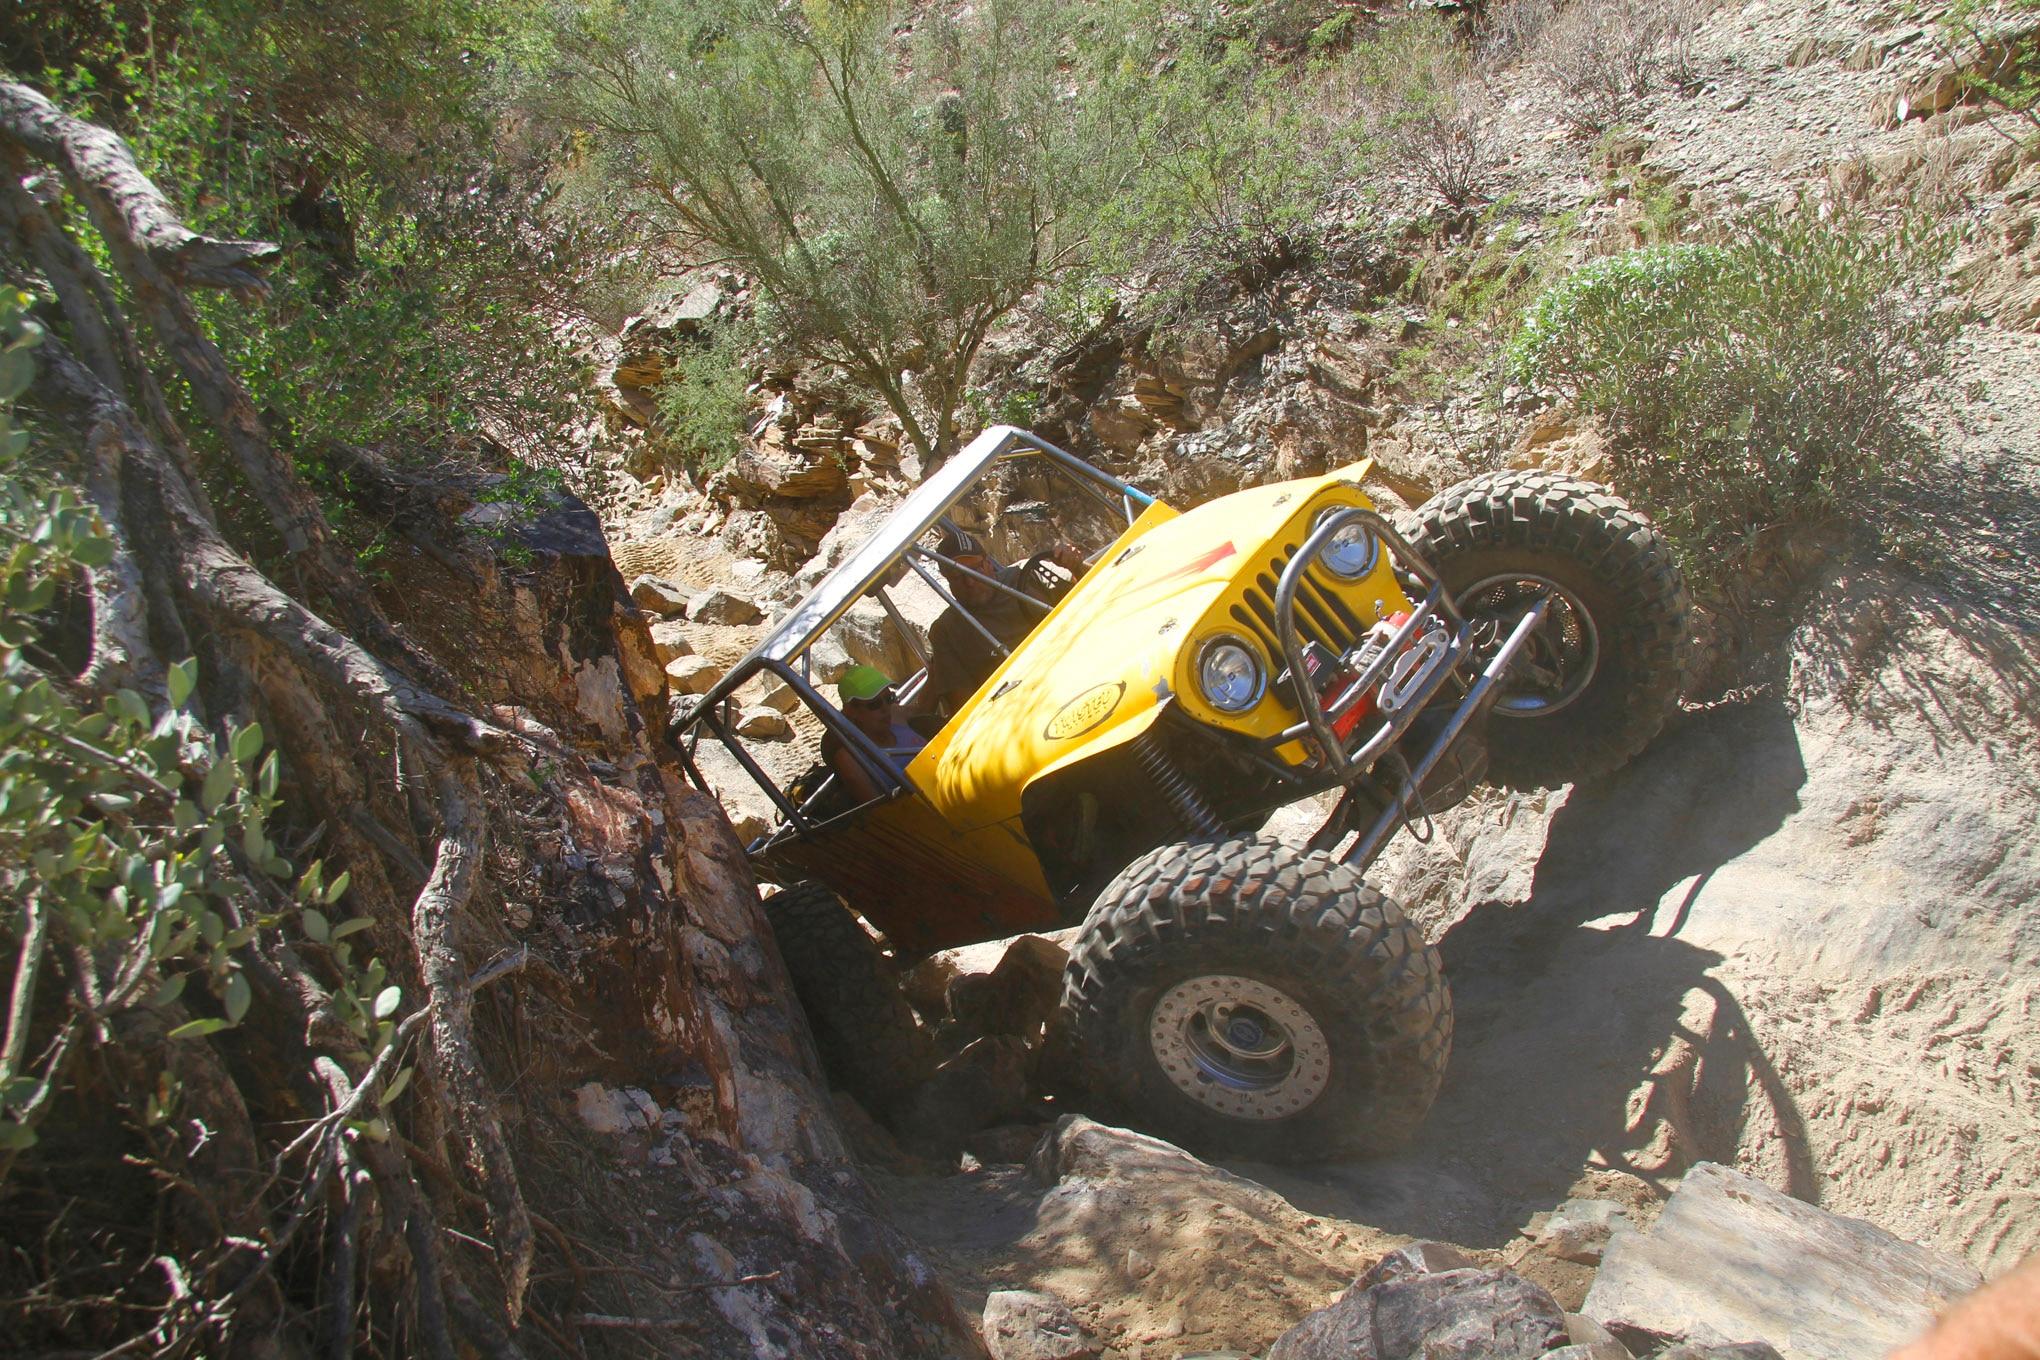 034 table mesa trails up anaconda yellow cj buggy